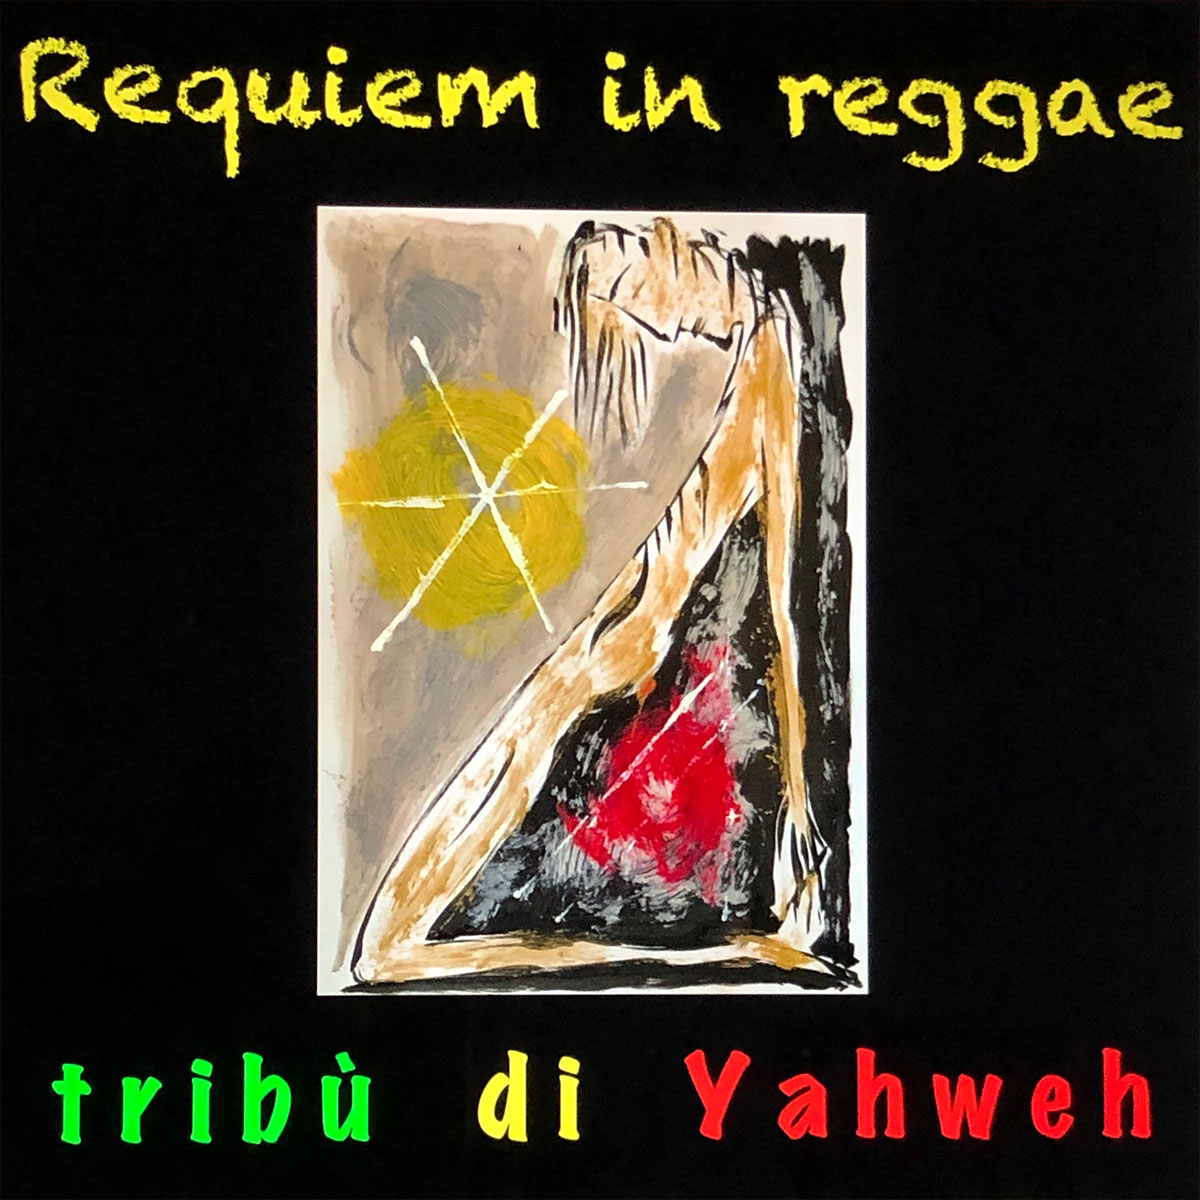 https://www.tribudiyahweh.com/wp/wp-content/uploads/2019/02/Requiem-in-reggae.jpg